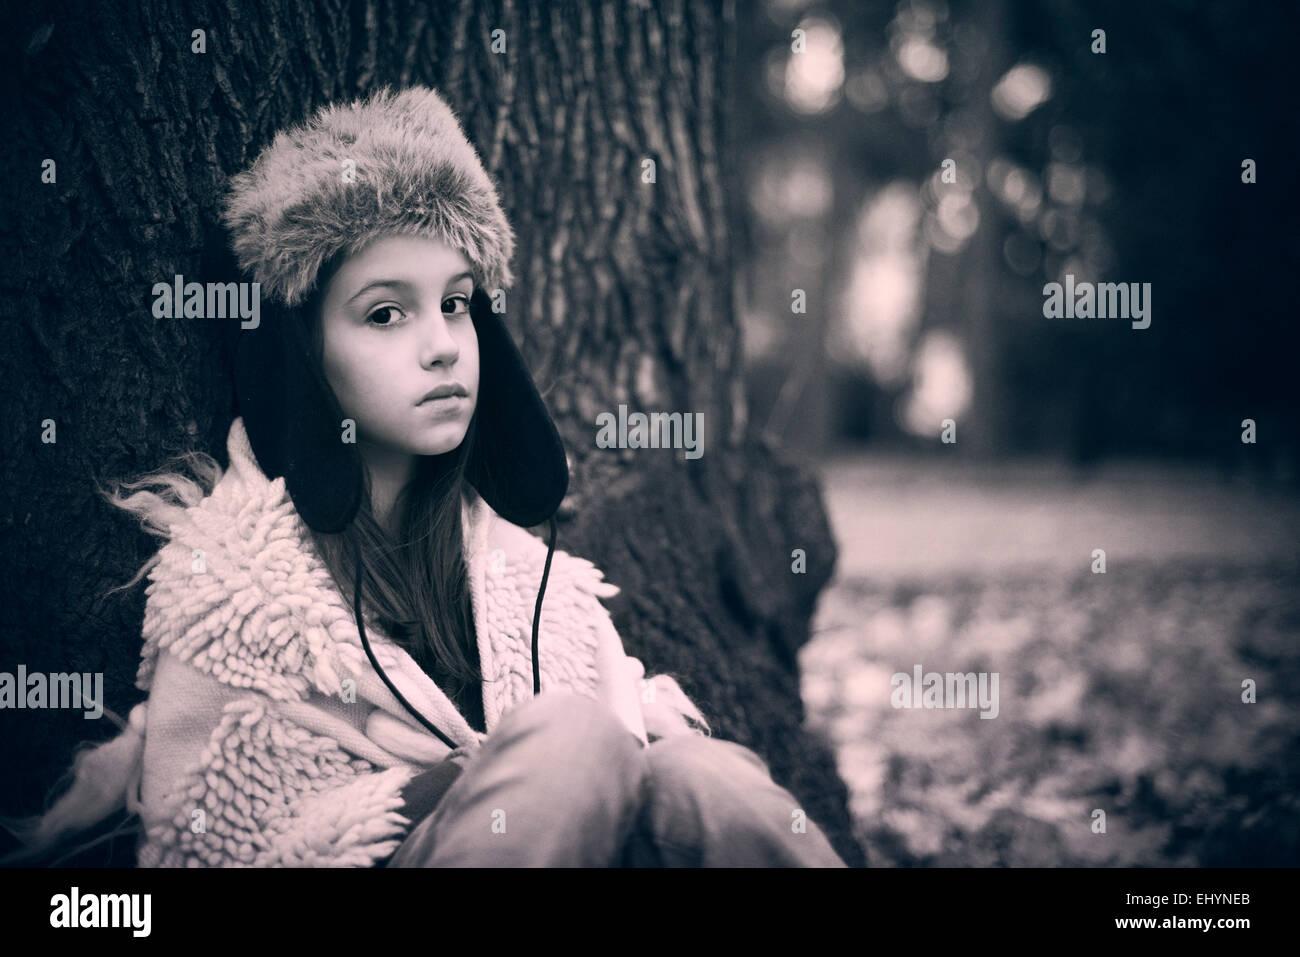 Triste chica ha impactado contra un árbol Imagen De Stock